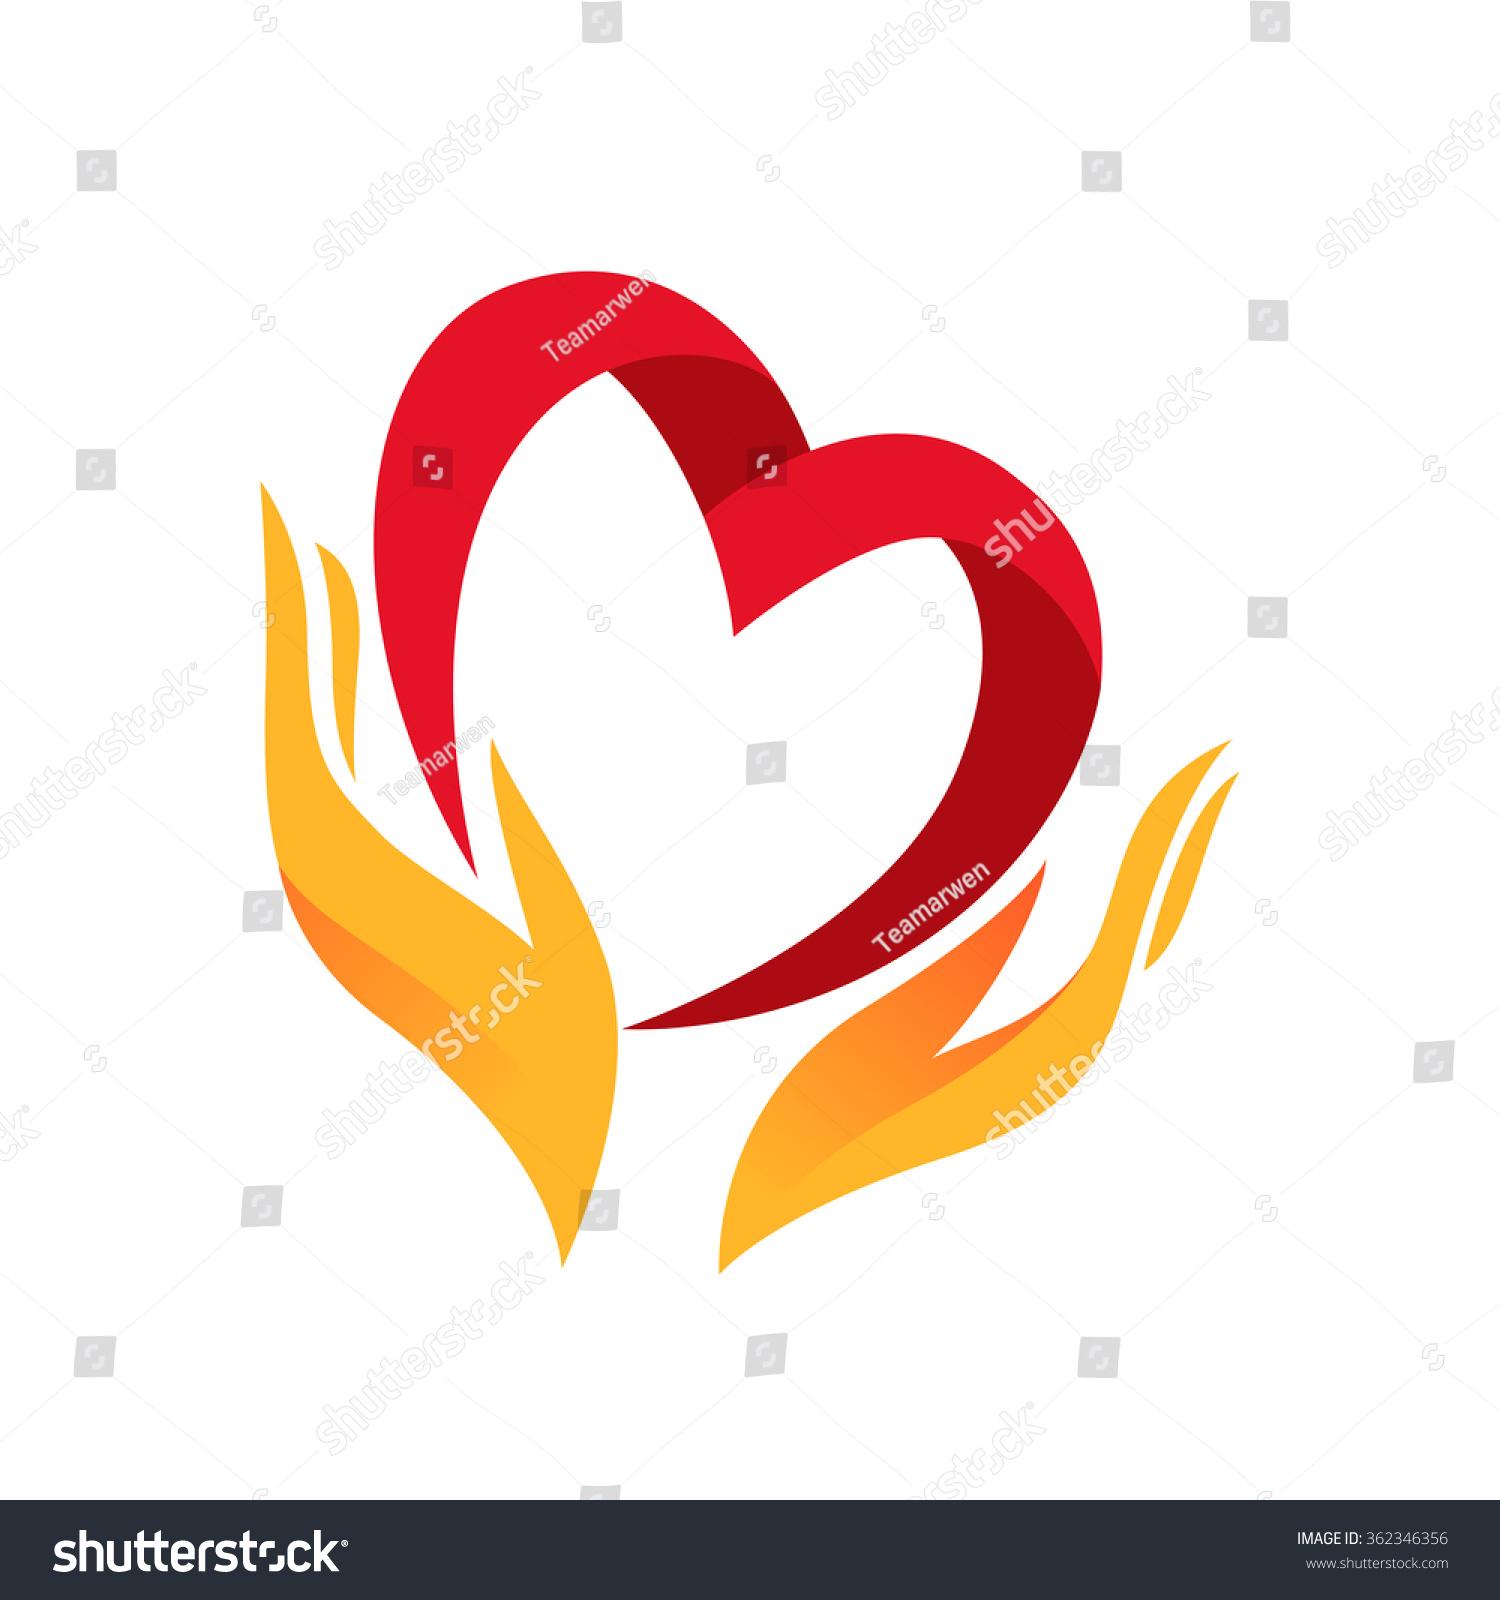 heart hand symbol sign icon logo stock vector 362346356